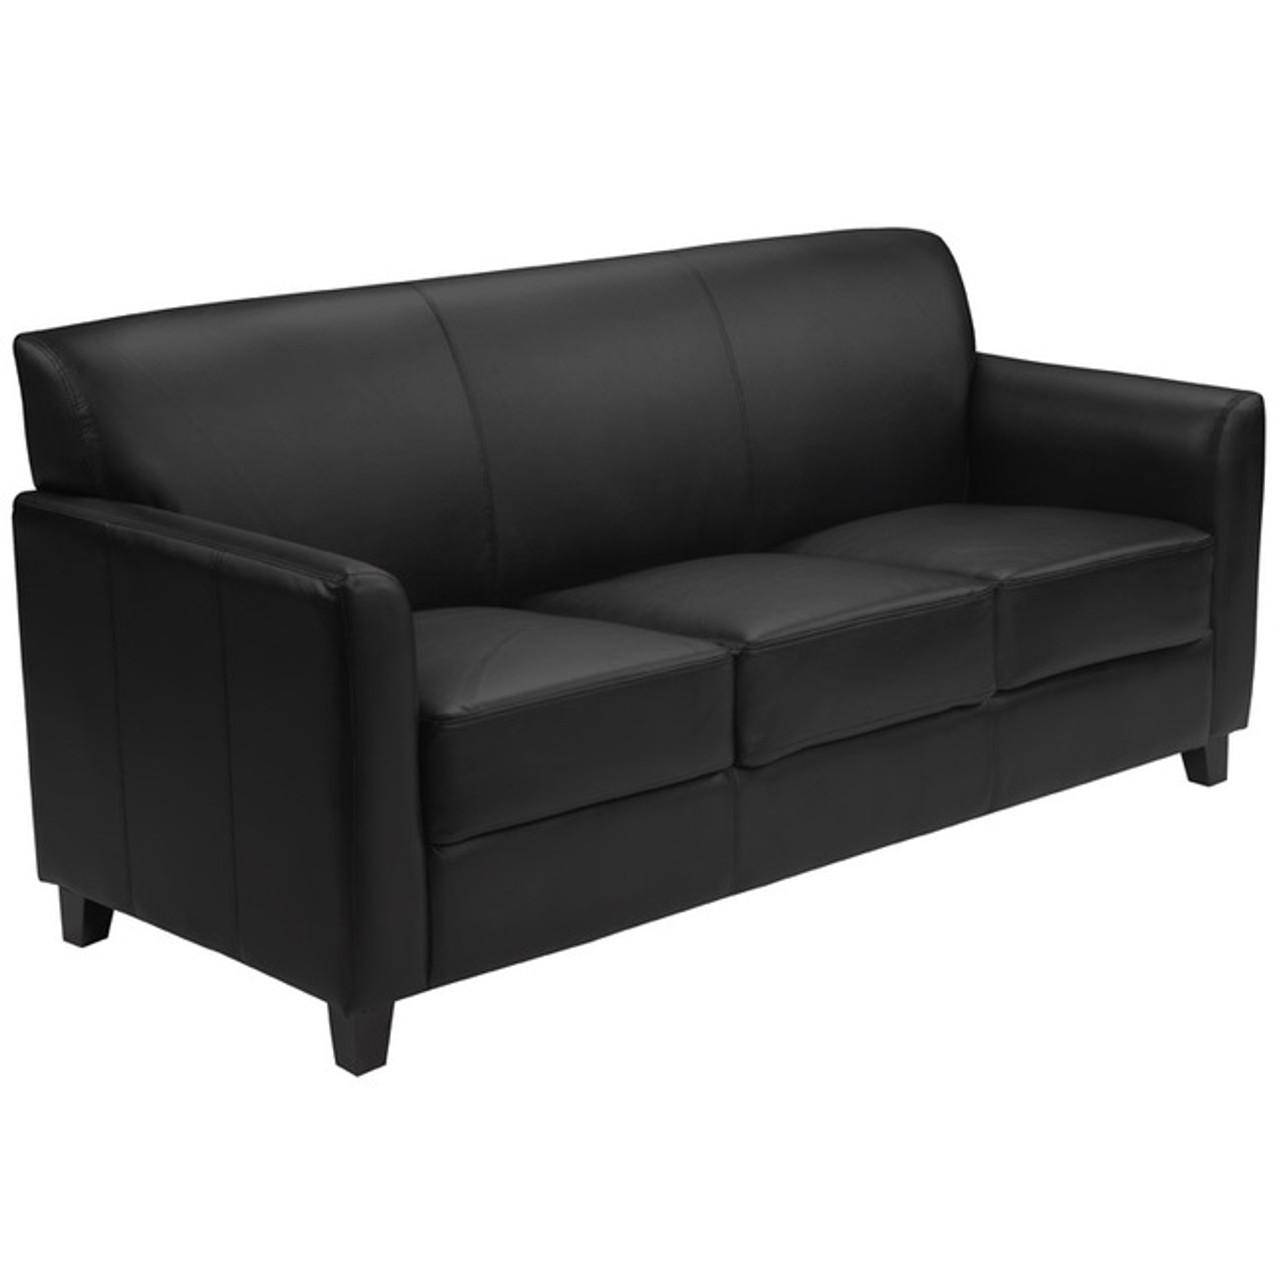 1pc Modern Leather Office Reception Sofa, FF-0552-13